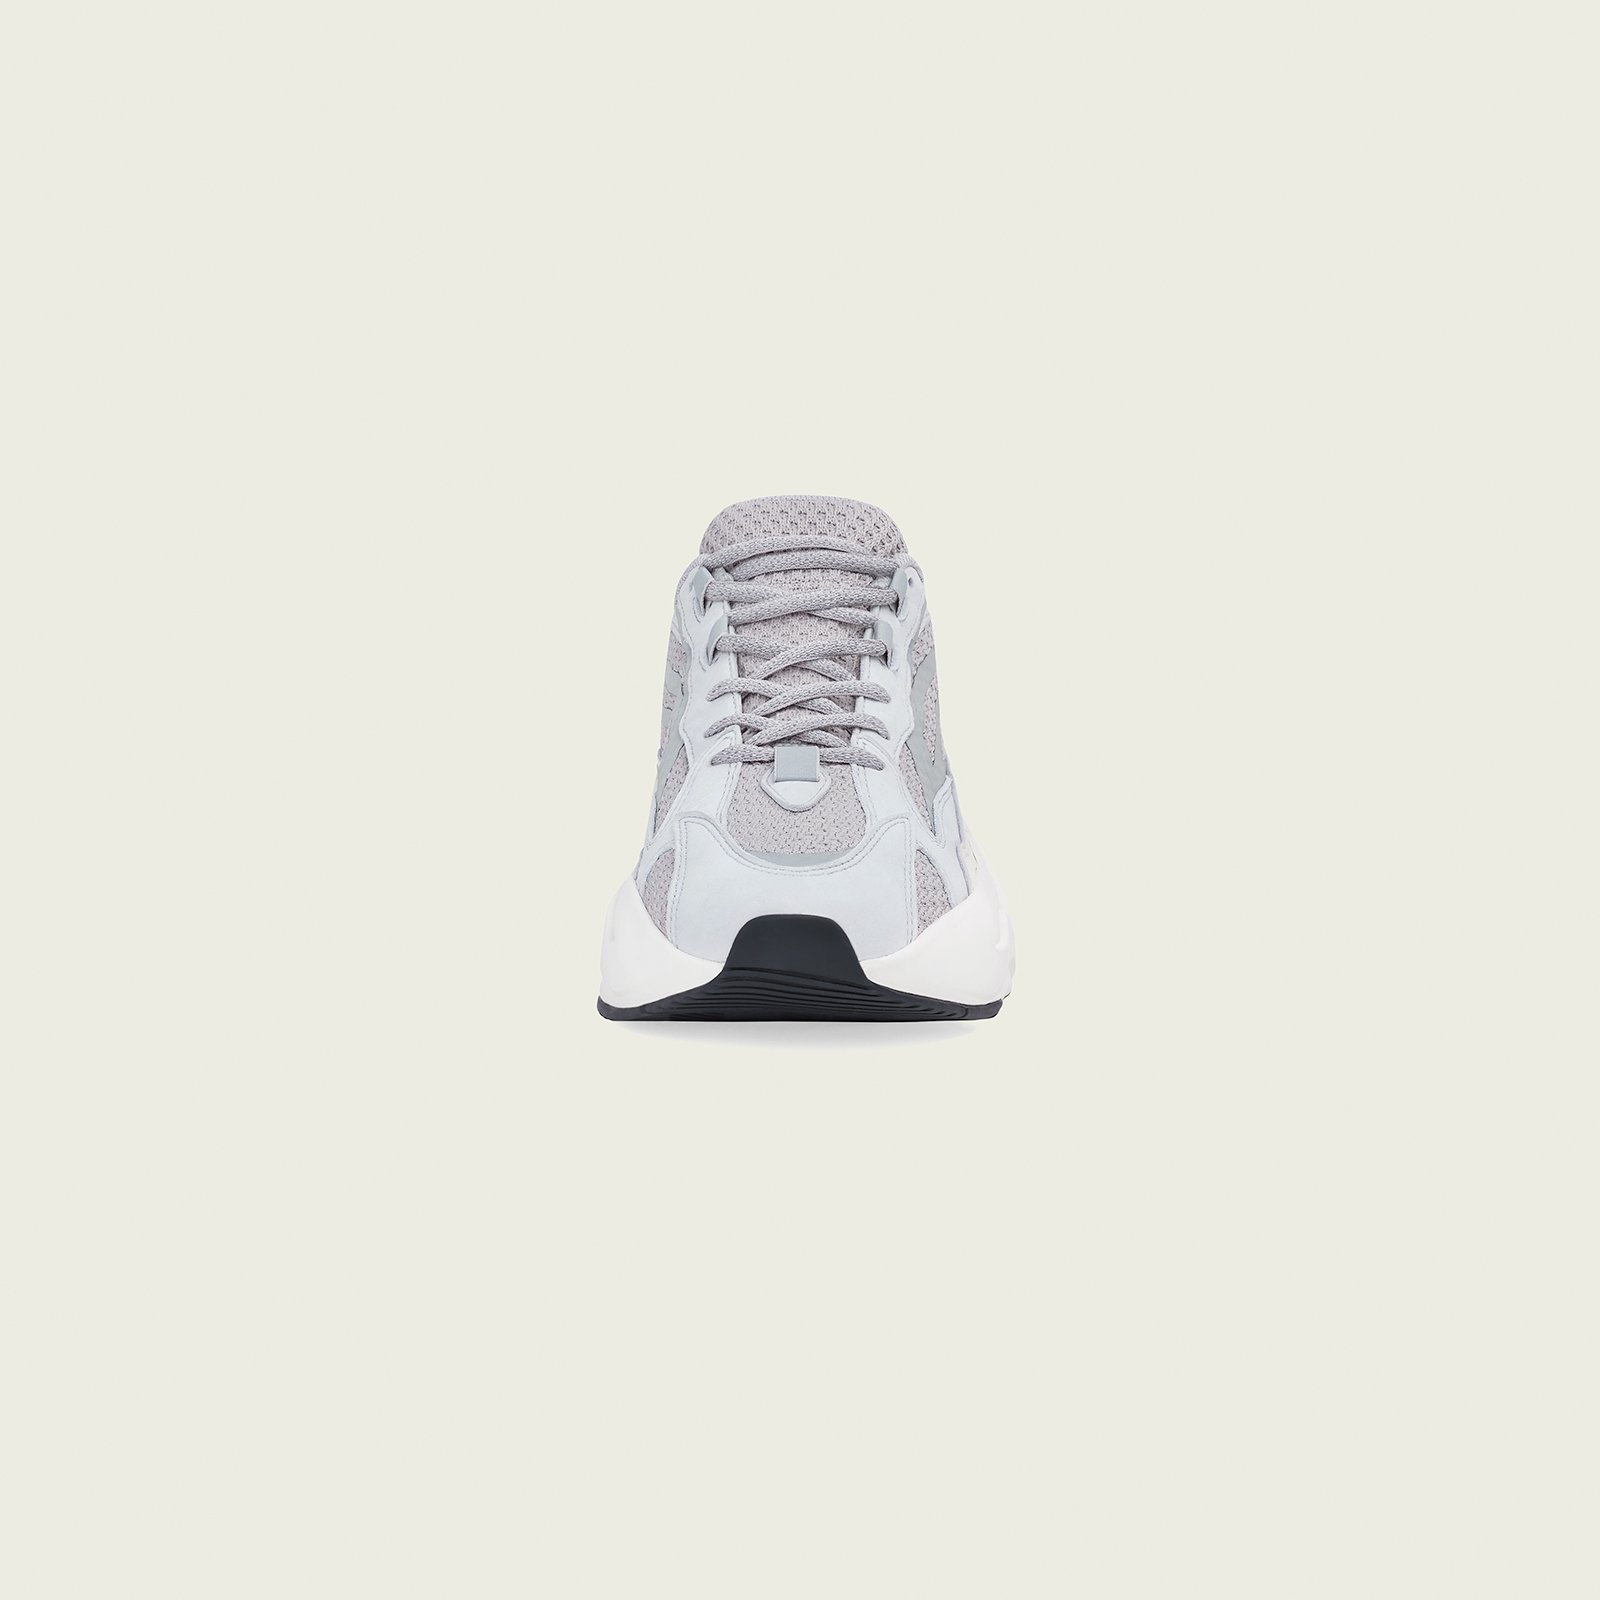 de01cf8ce67 ... adidas Originals x Kanye West Yeezy Boost 700 V2 ...